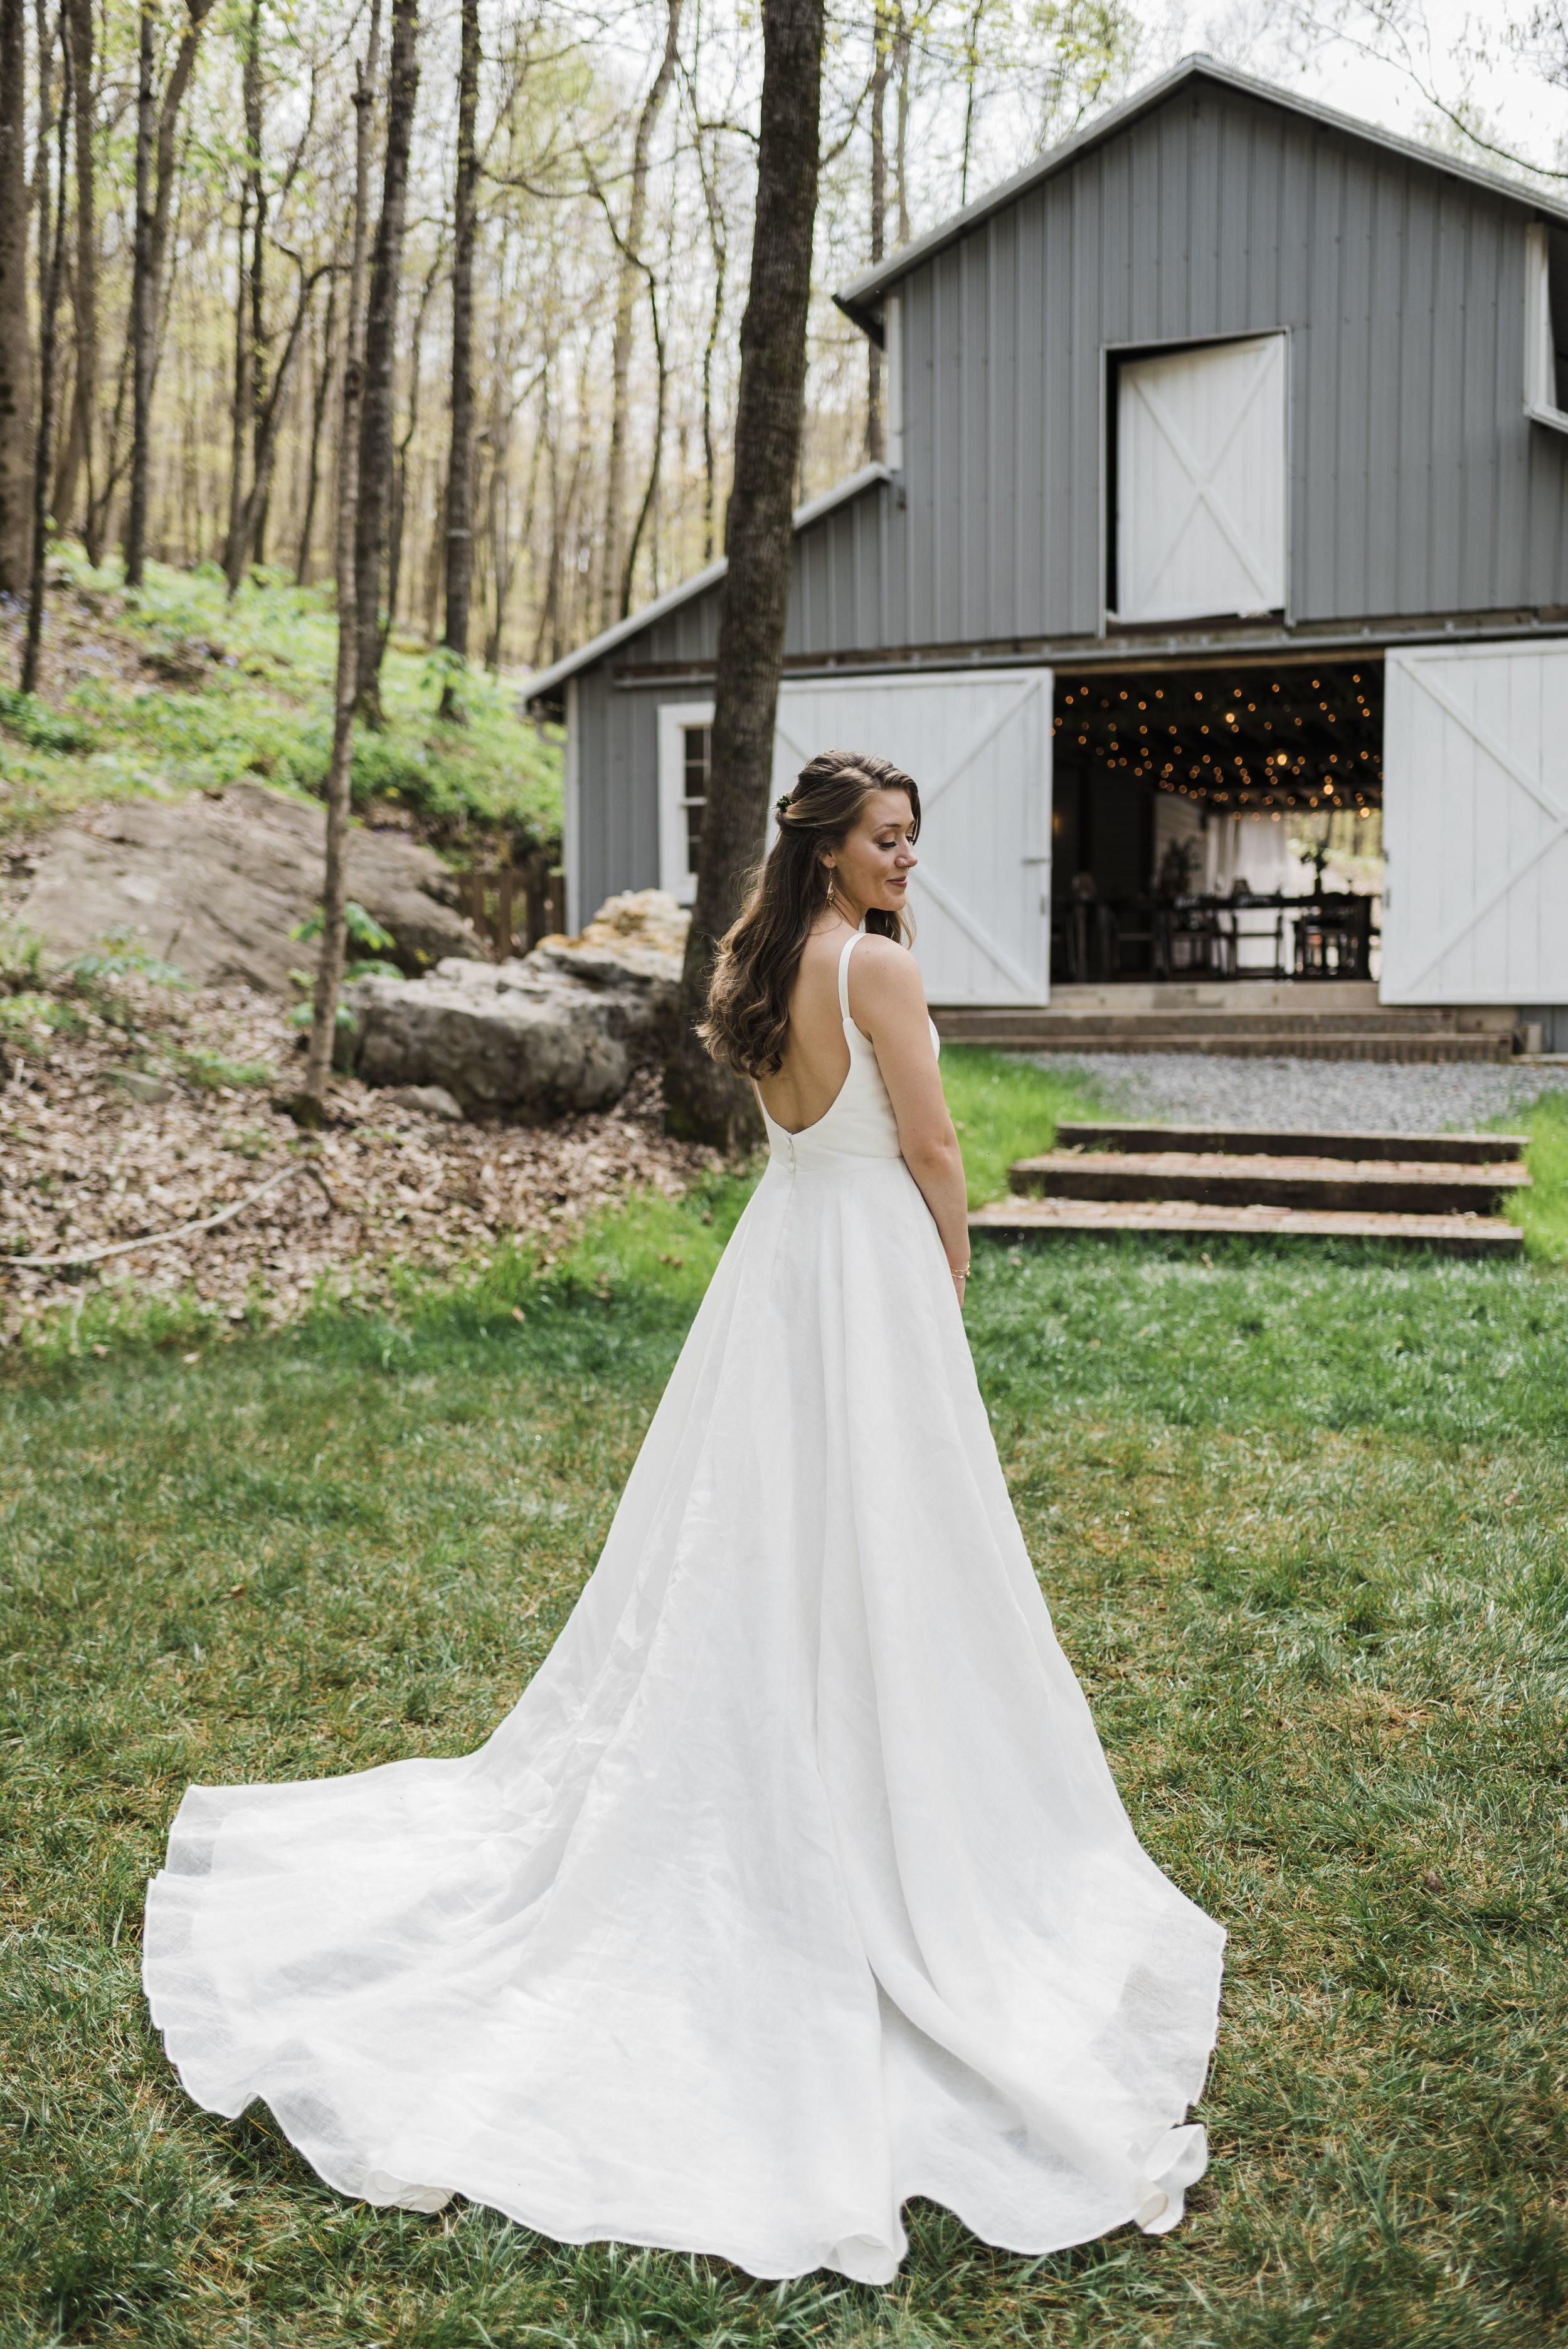 wedding bride Elizabeth dye dress chattanooga Tennessee